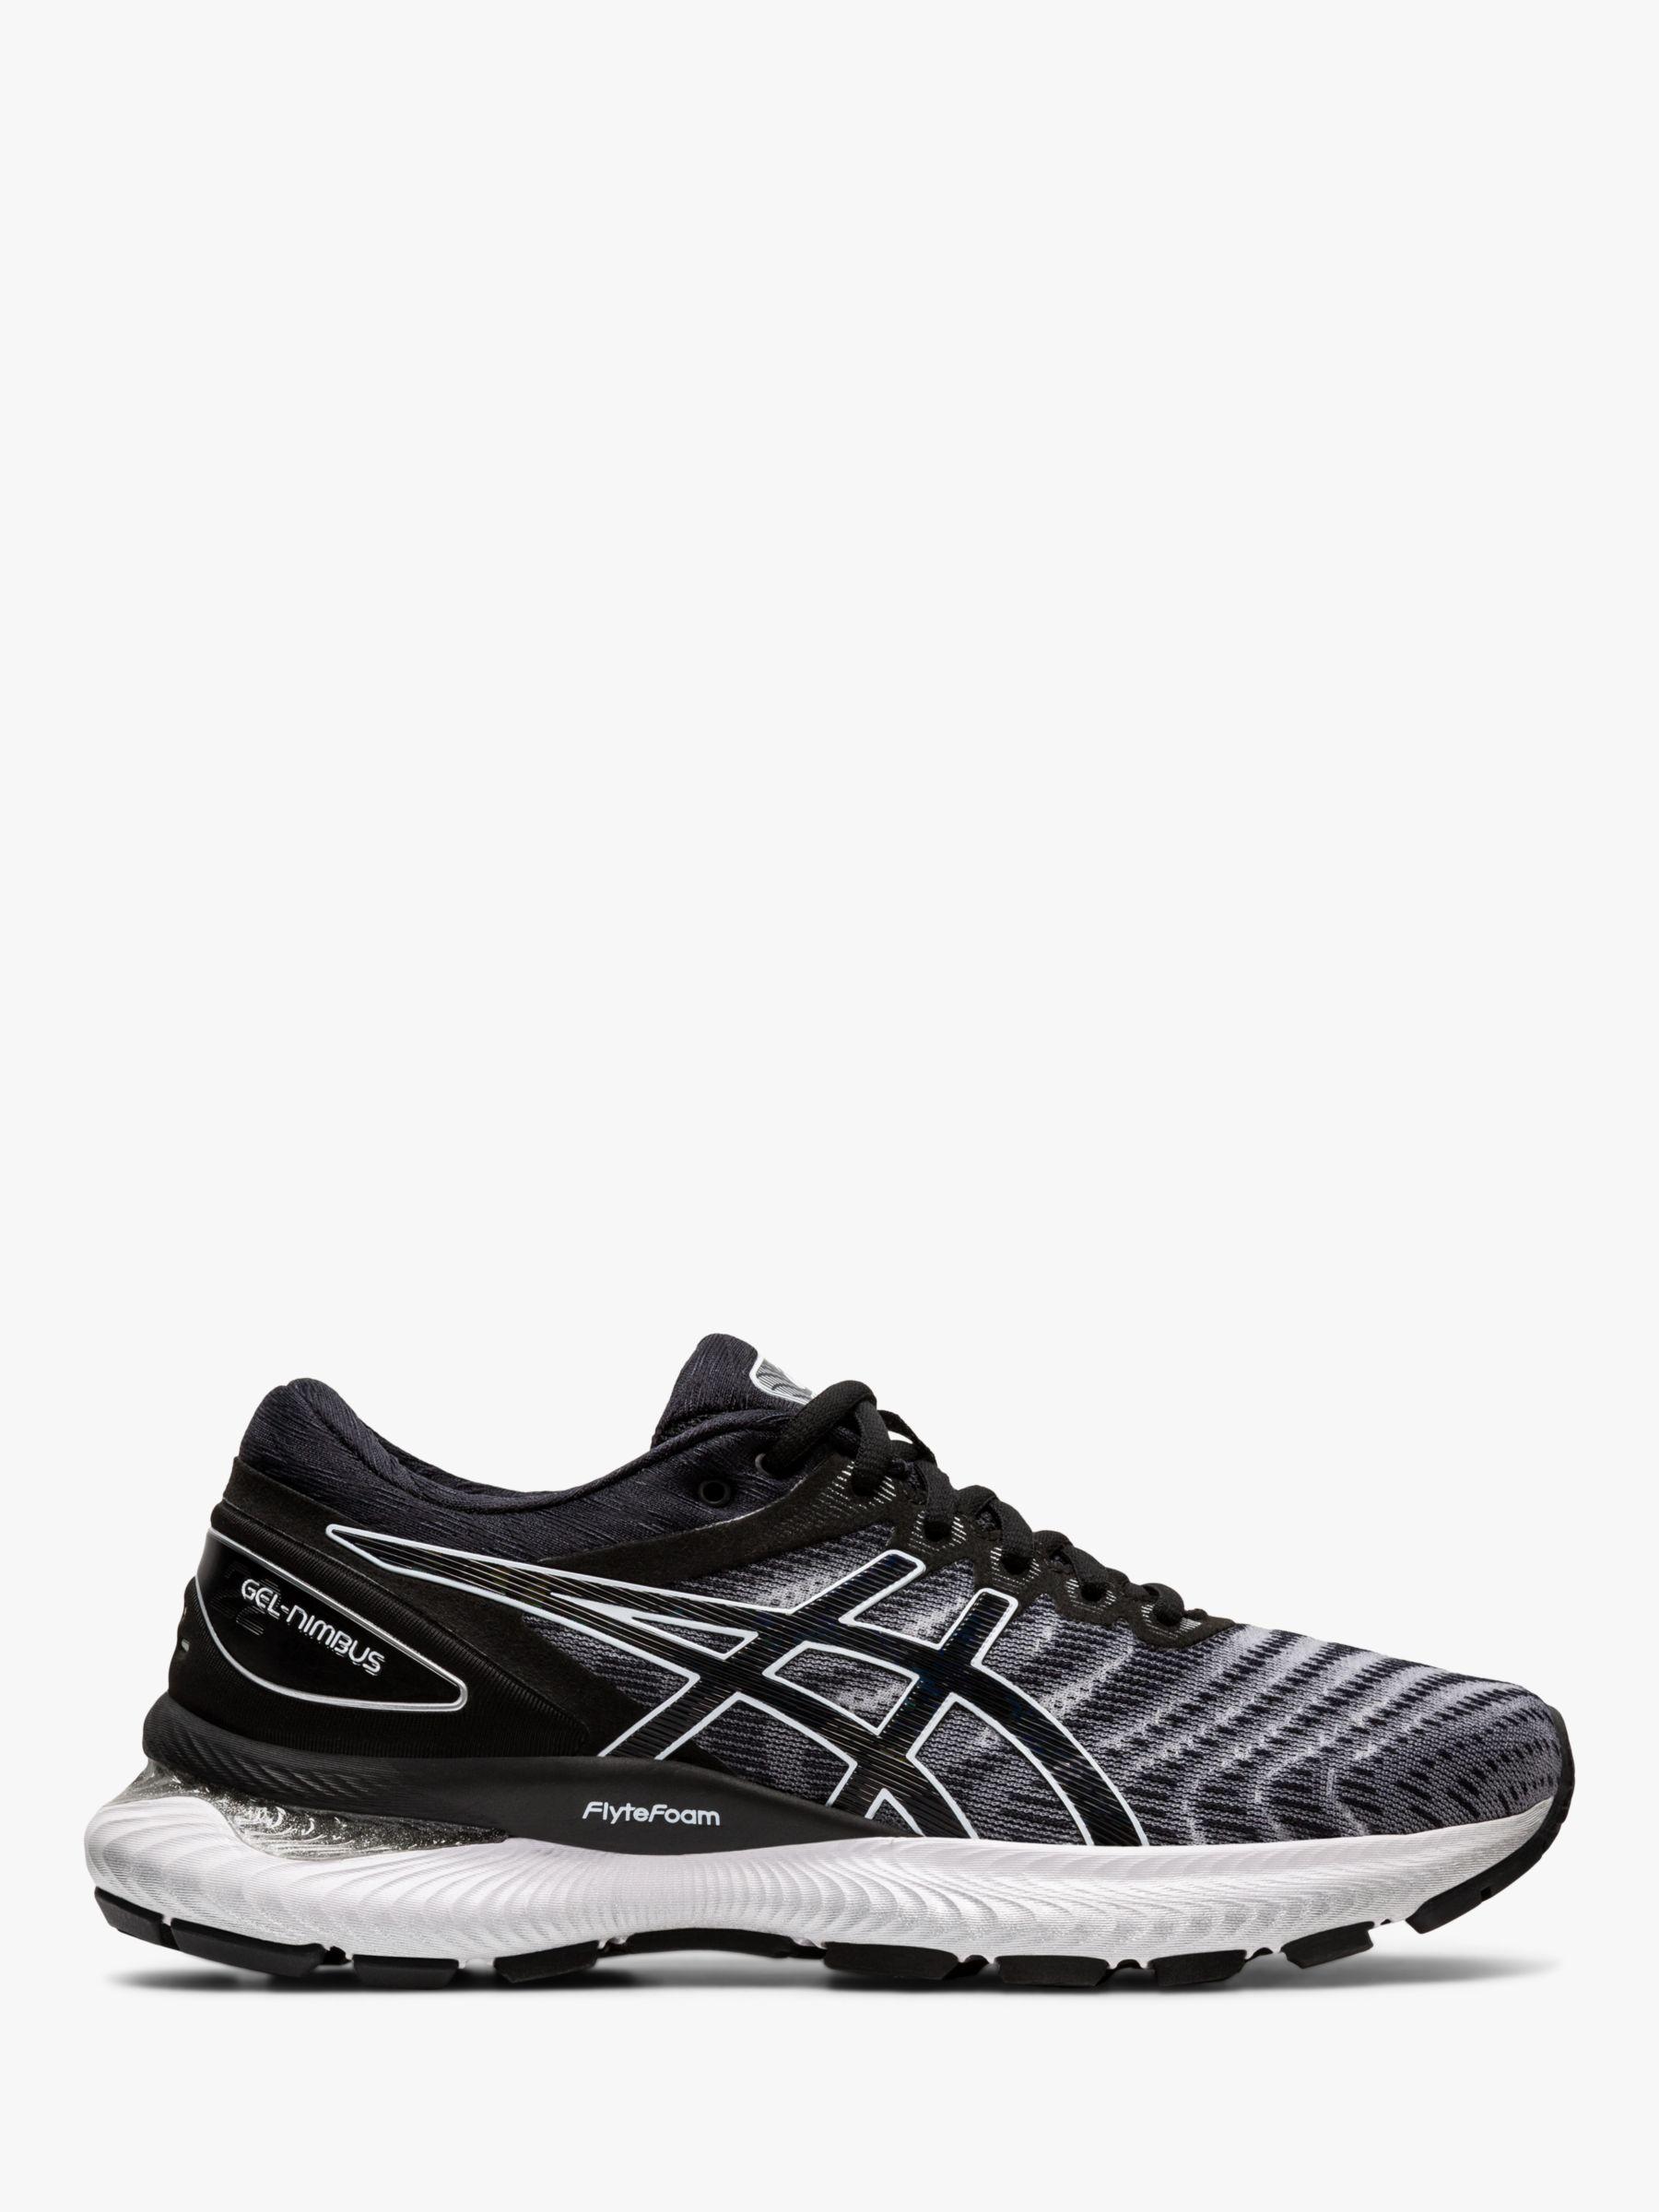 ASICS ASICS GEL-NIMBUS 22 Women's Running Shoes